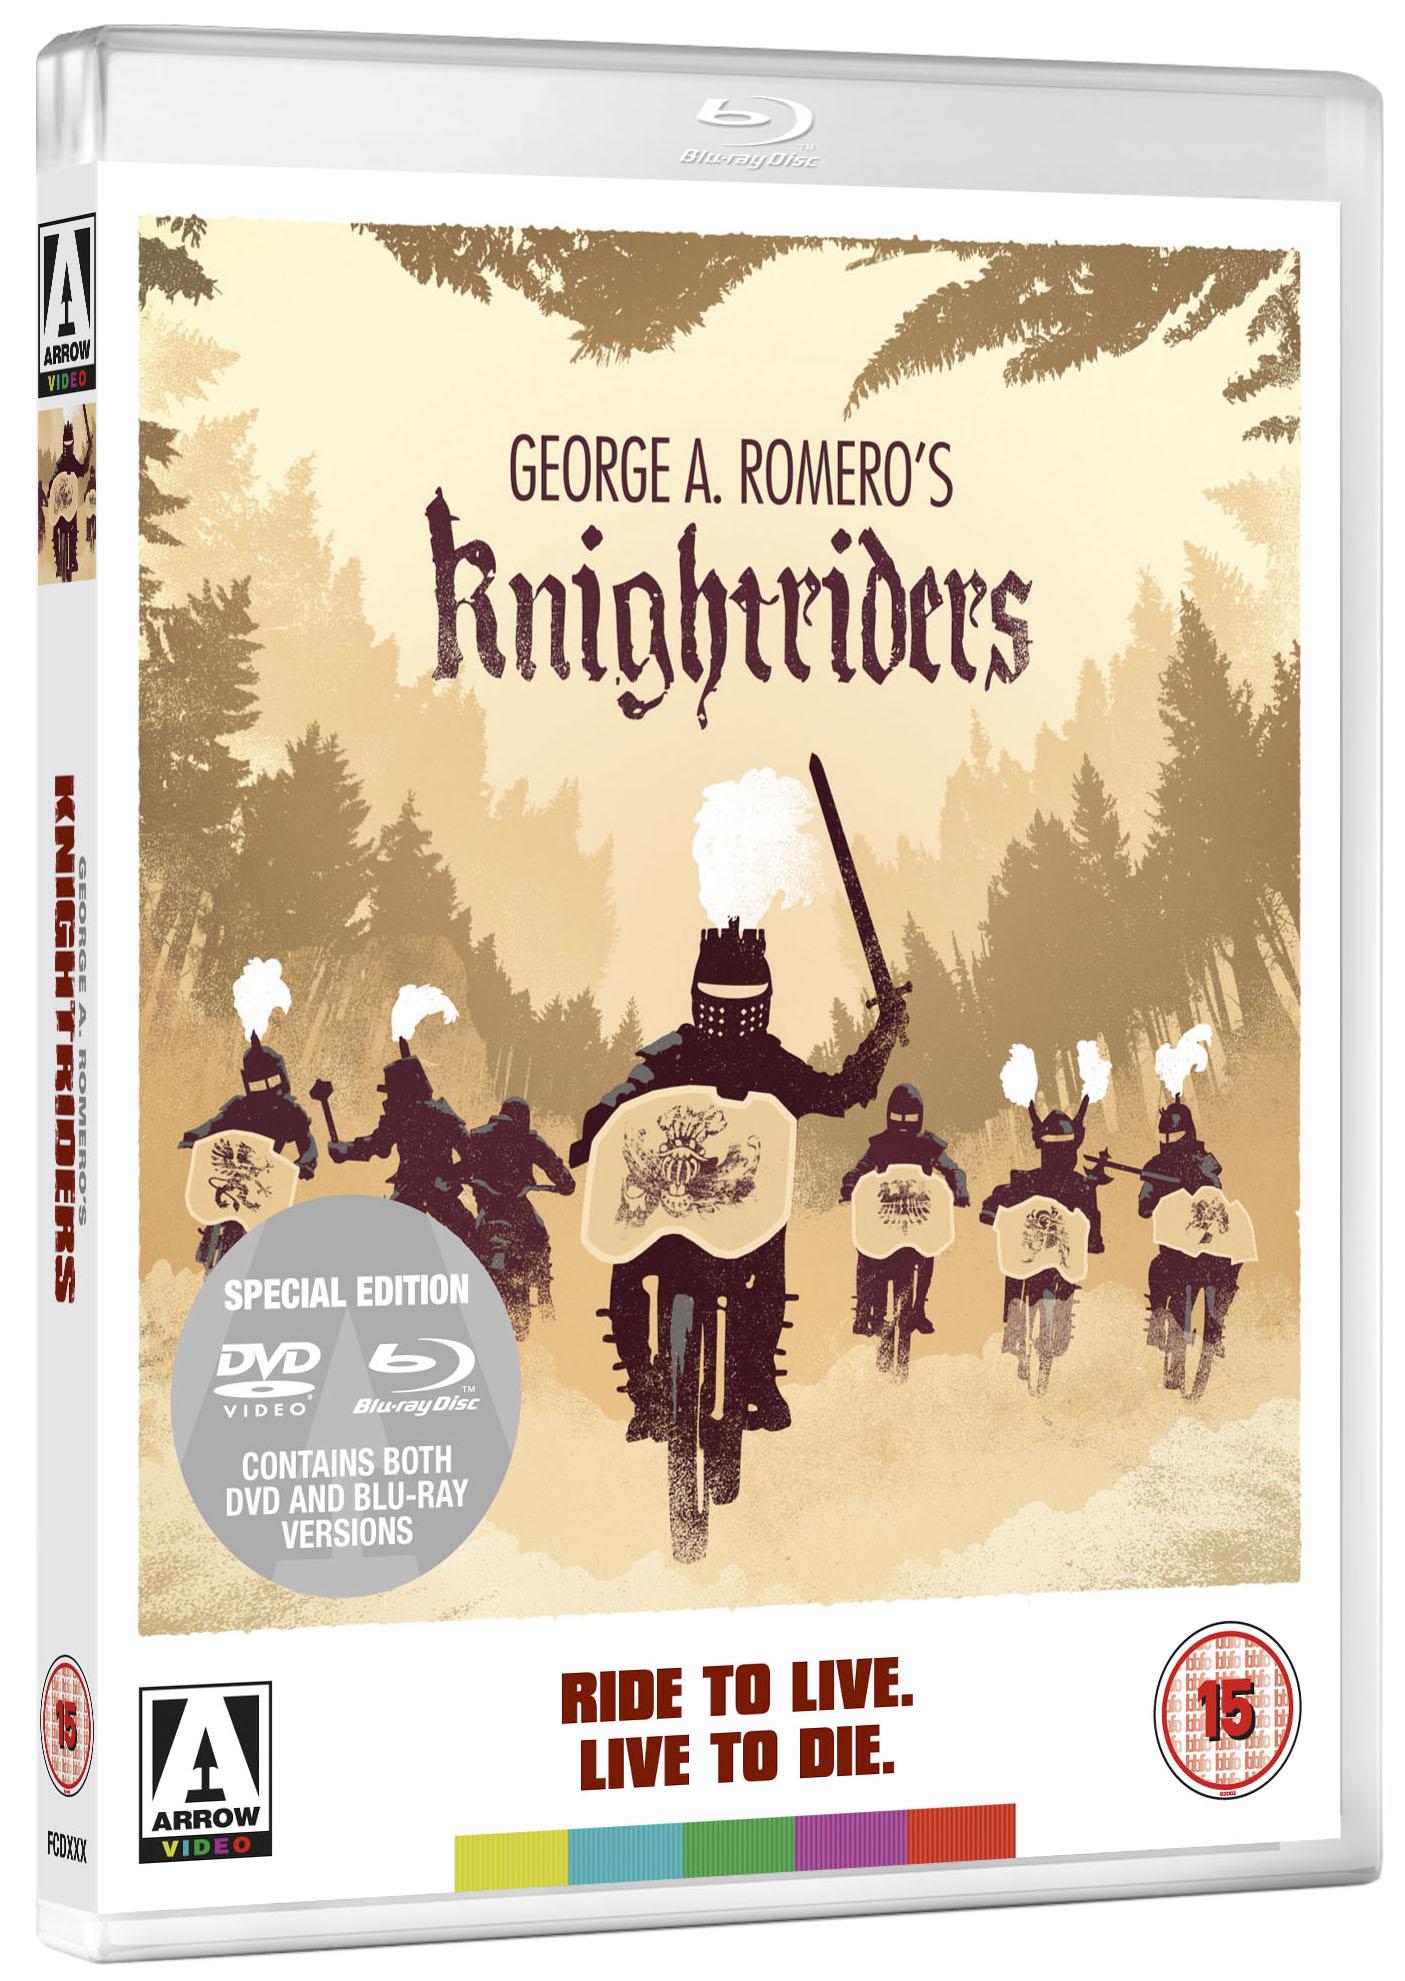 Knightrider 3d erotica image